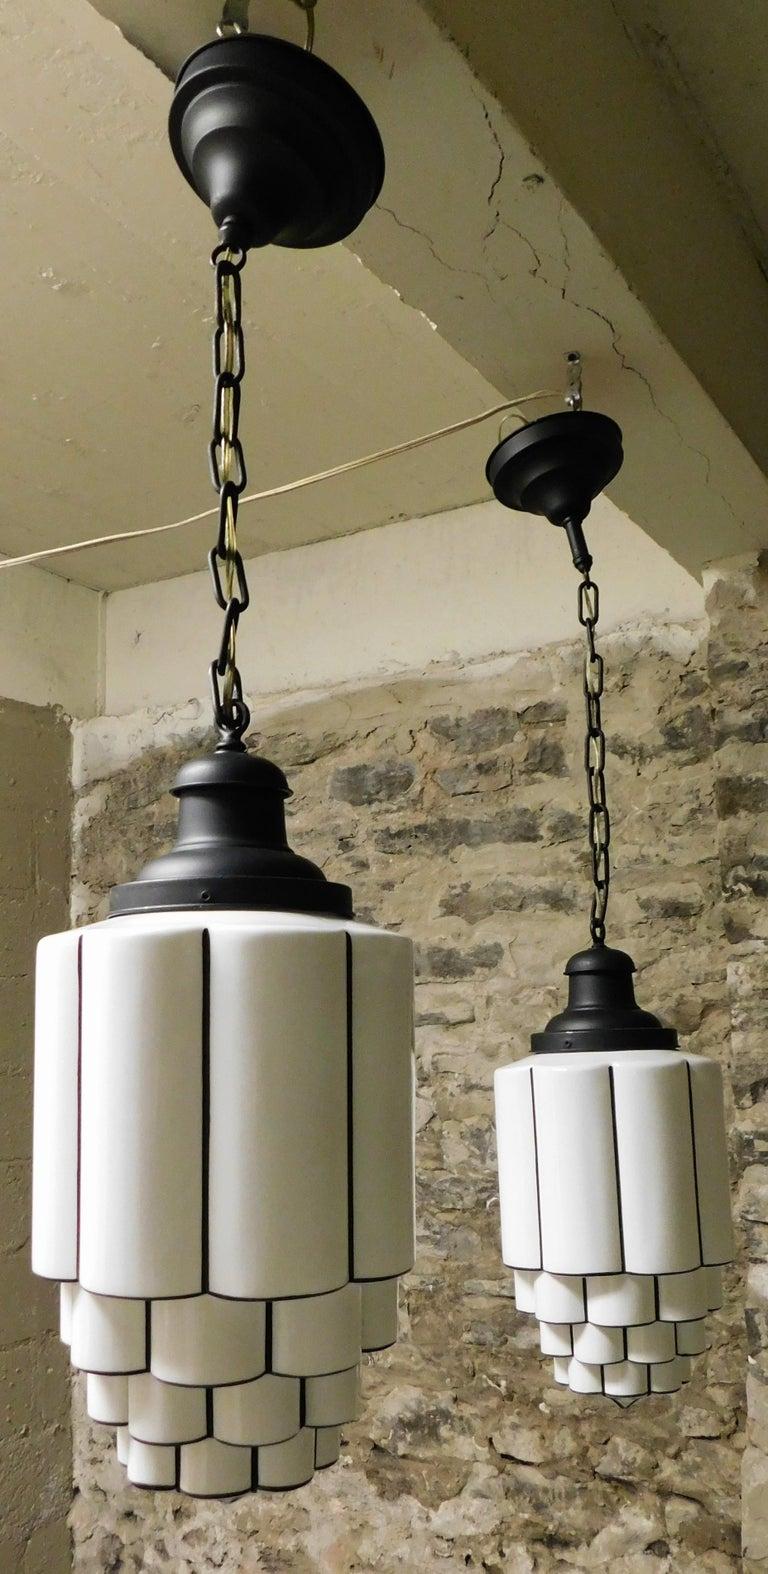 Pair of tiered milk glass art deco skyscraper pendant lights circa 1930 in good condition